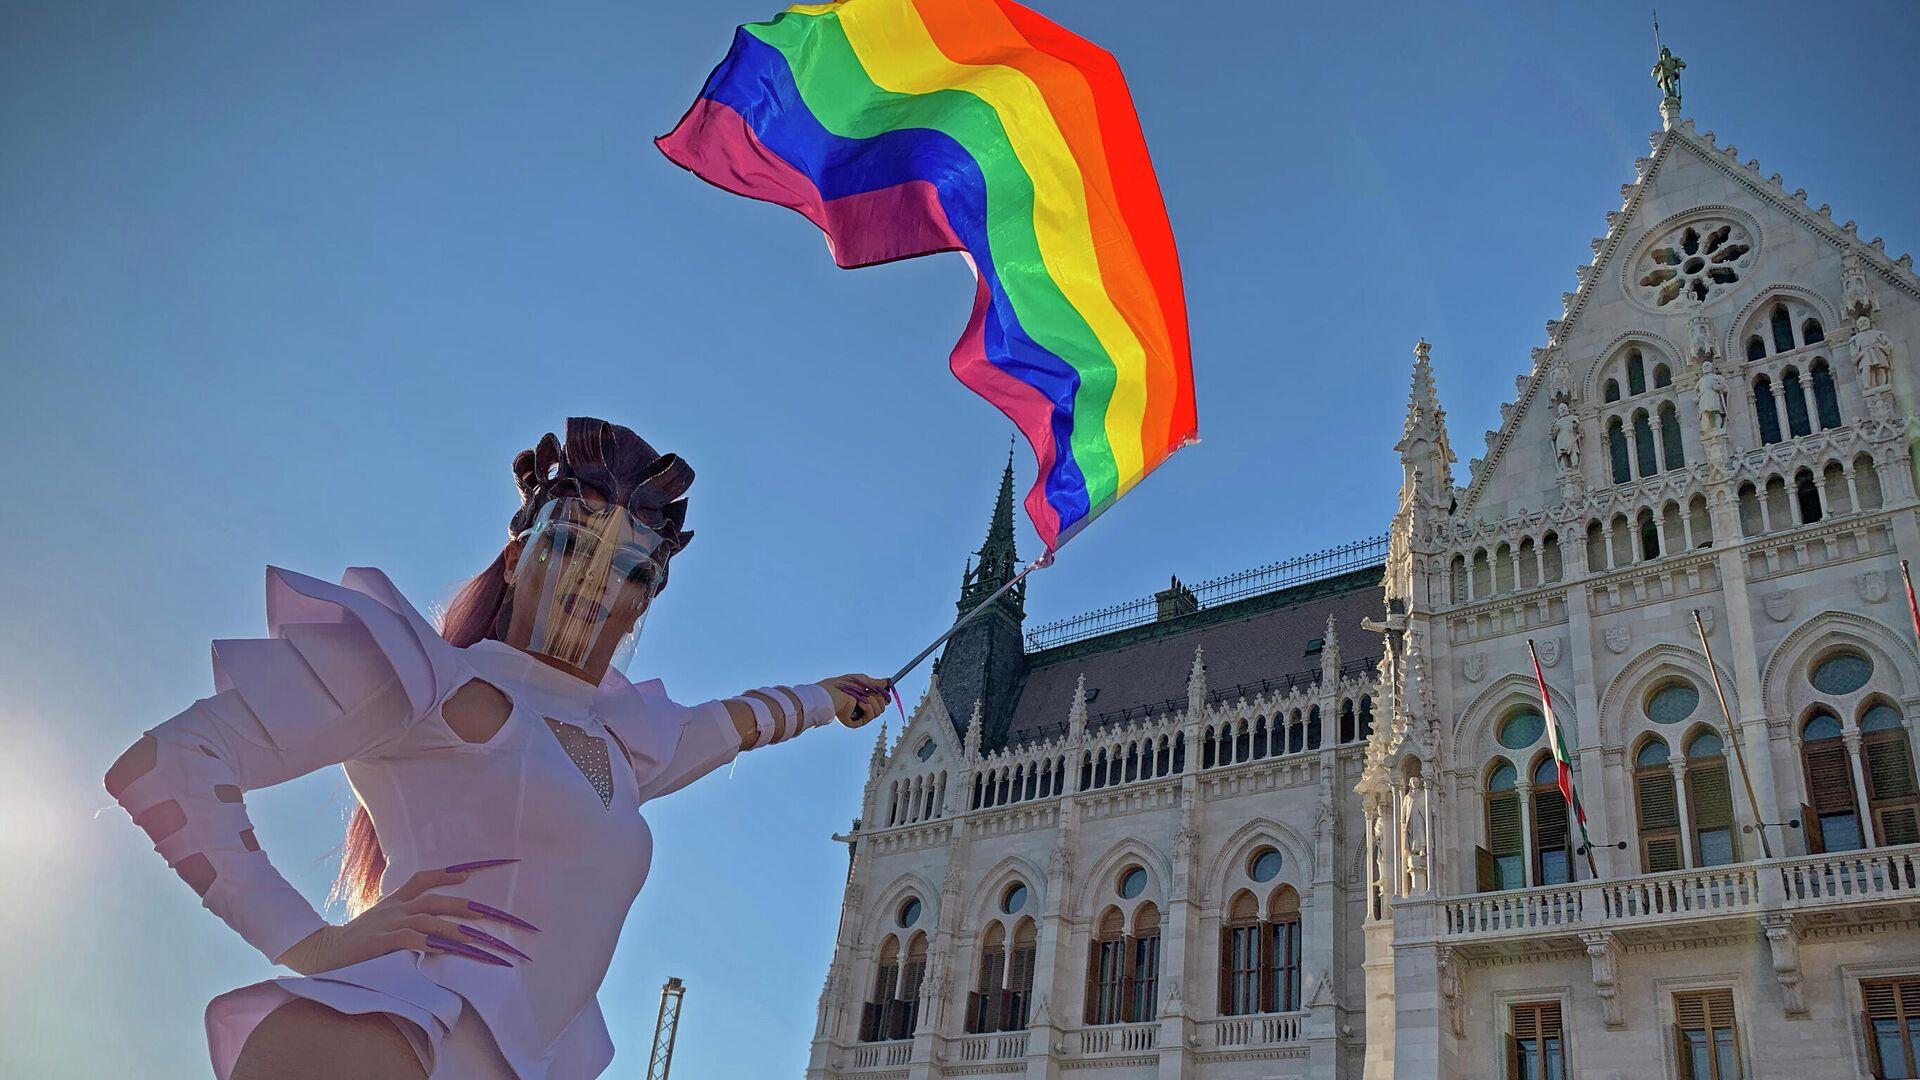 LGBT aktivisti ispred mađarskog parlamenta - Sputnik Srbija, 1920, 17.09.2021